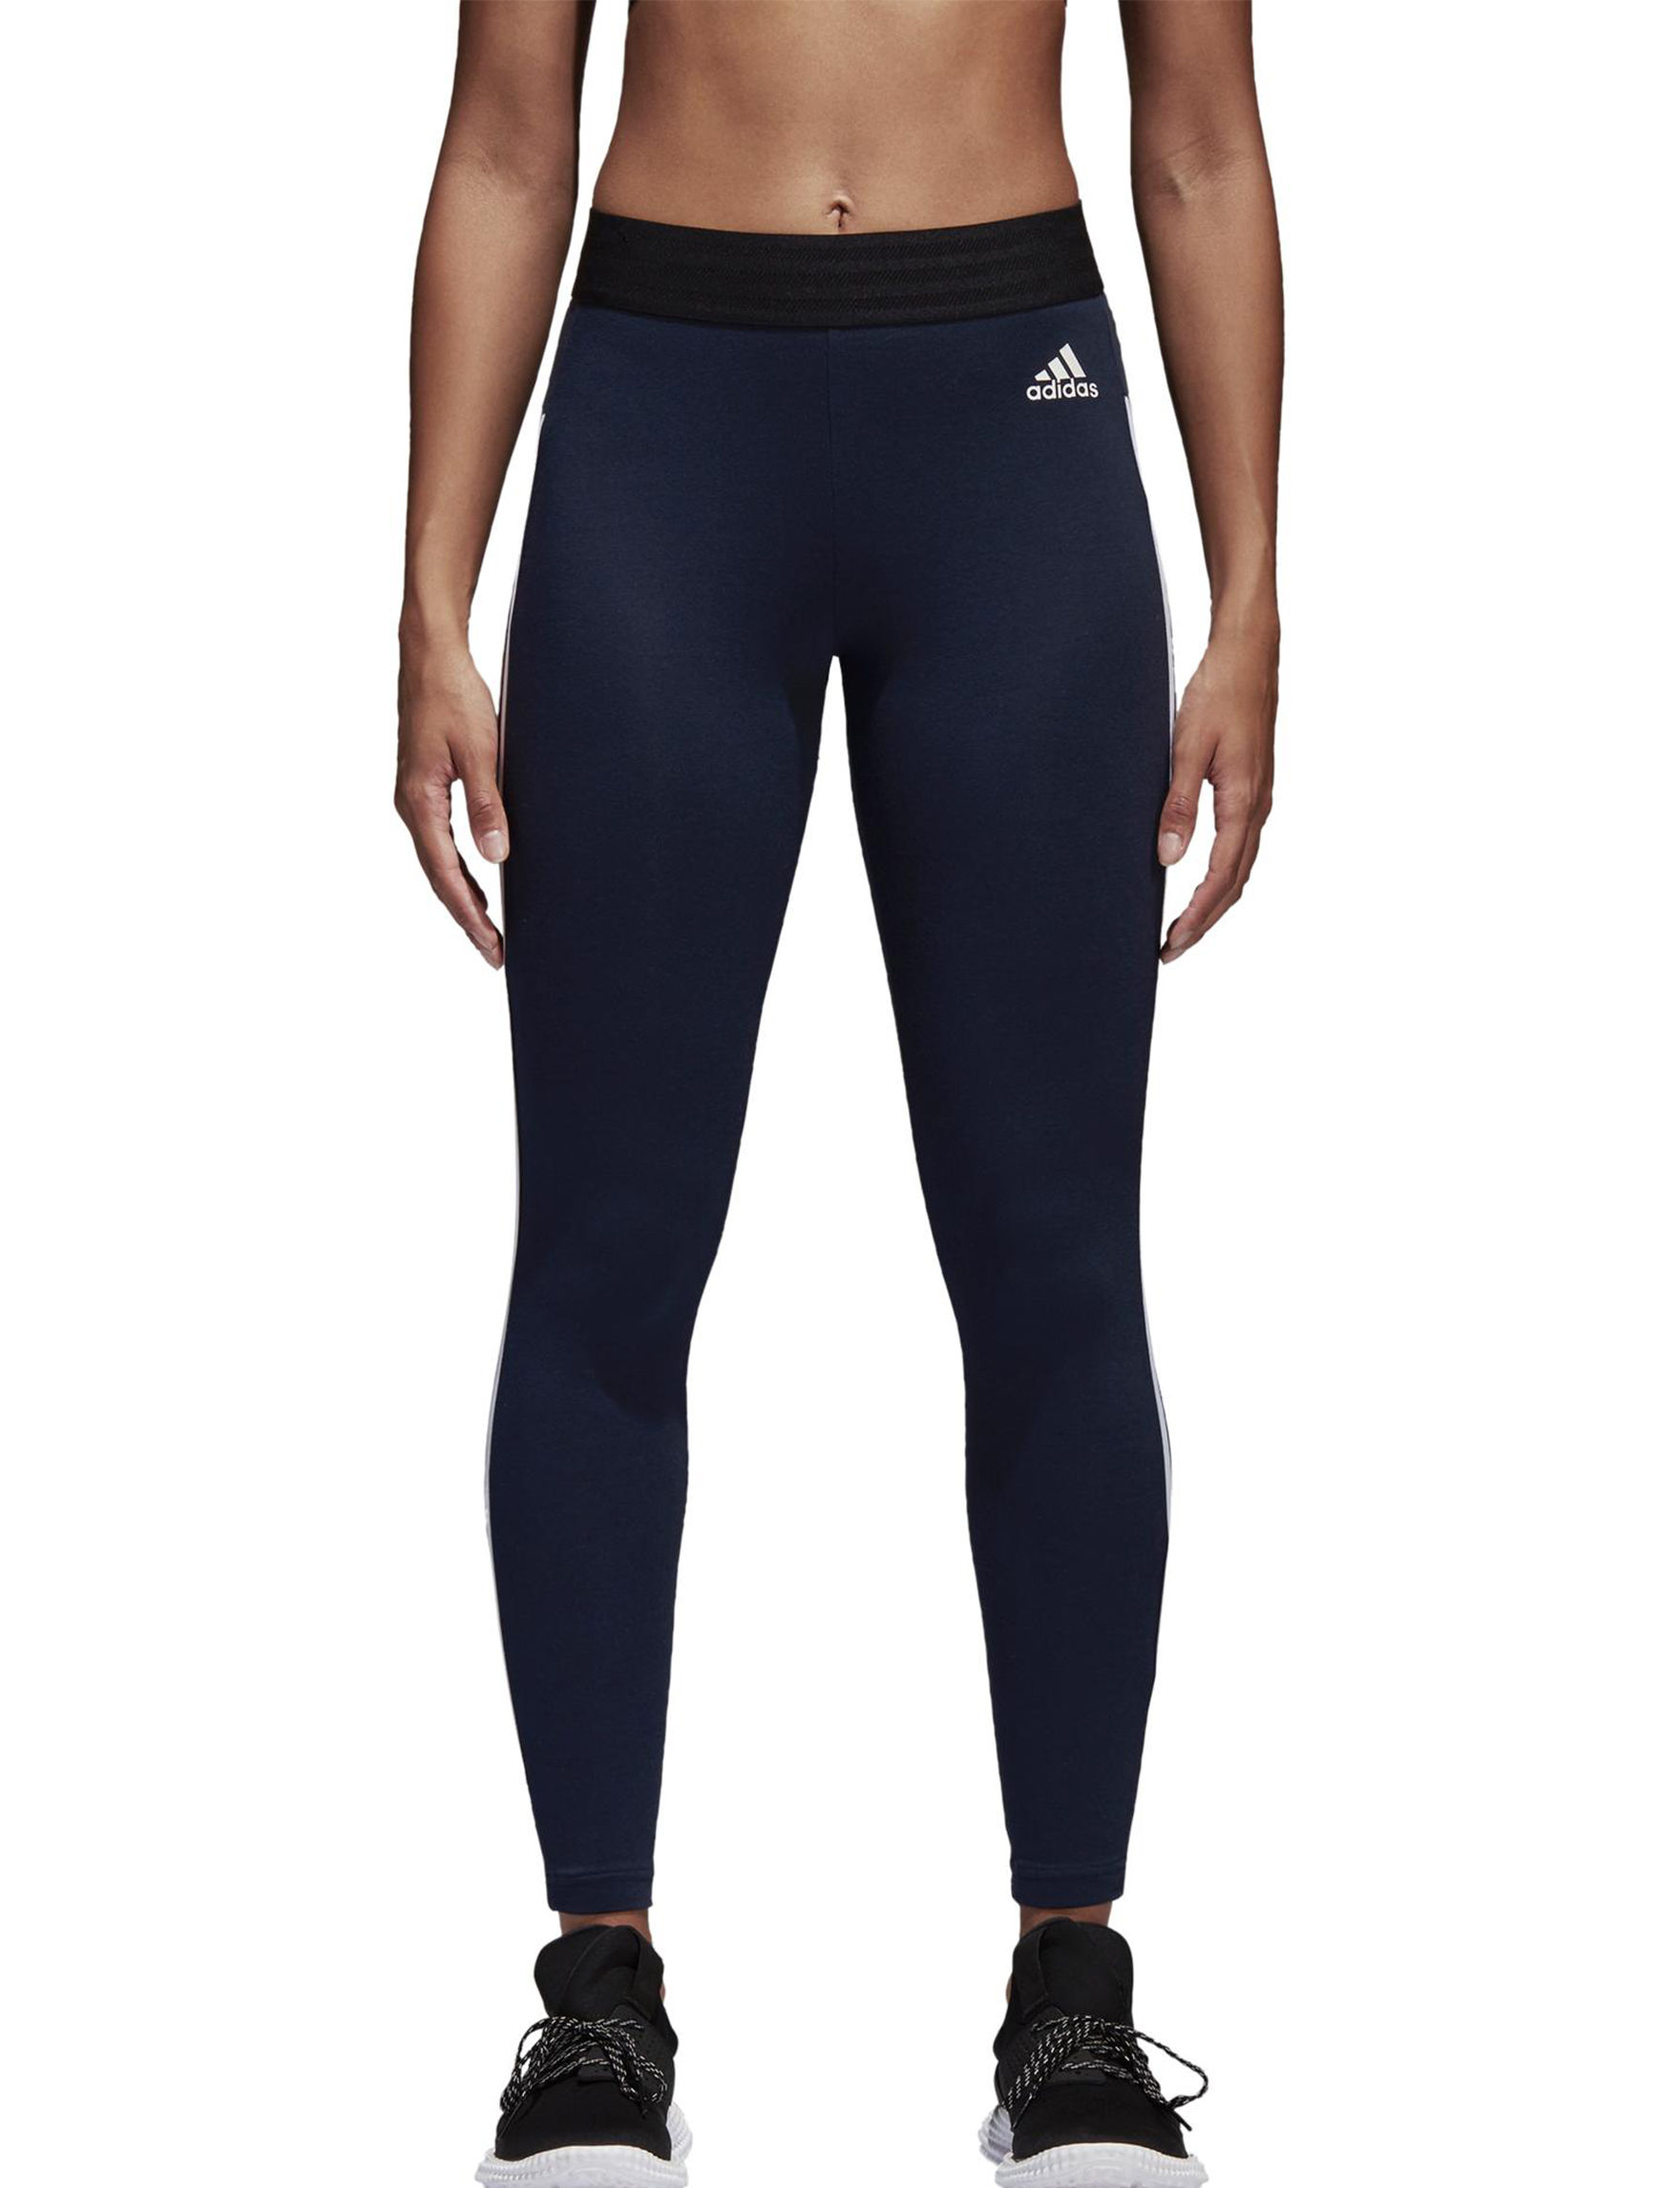 Adidas Navy / White Leggings